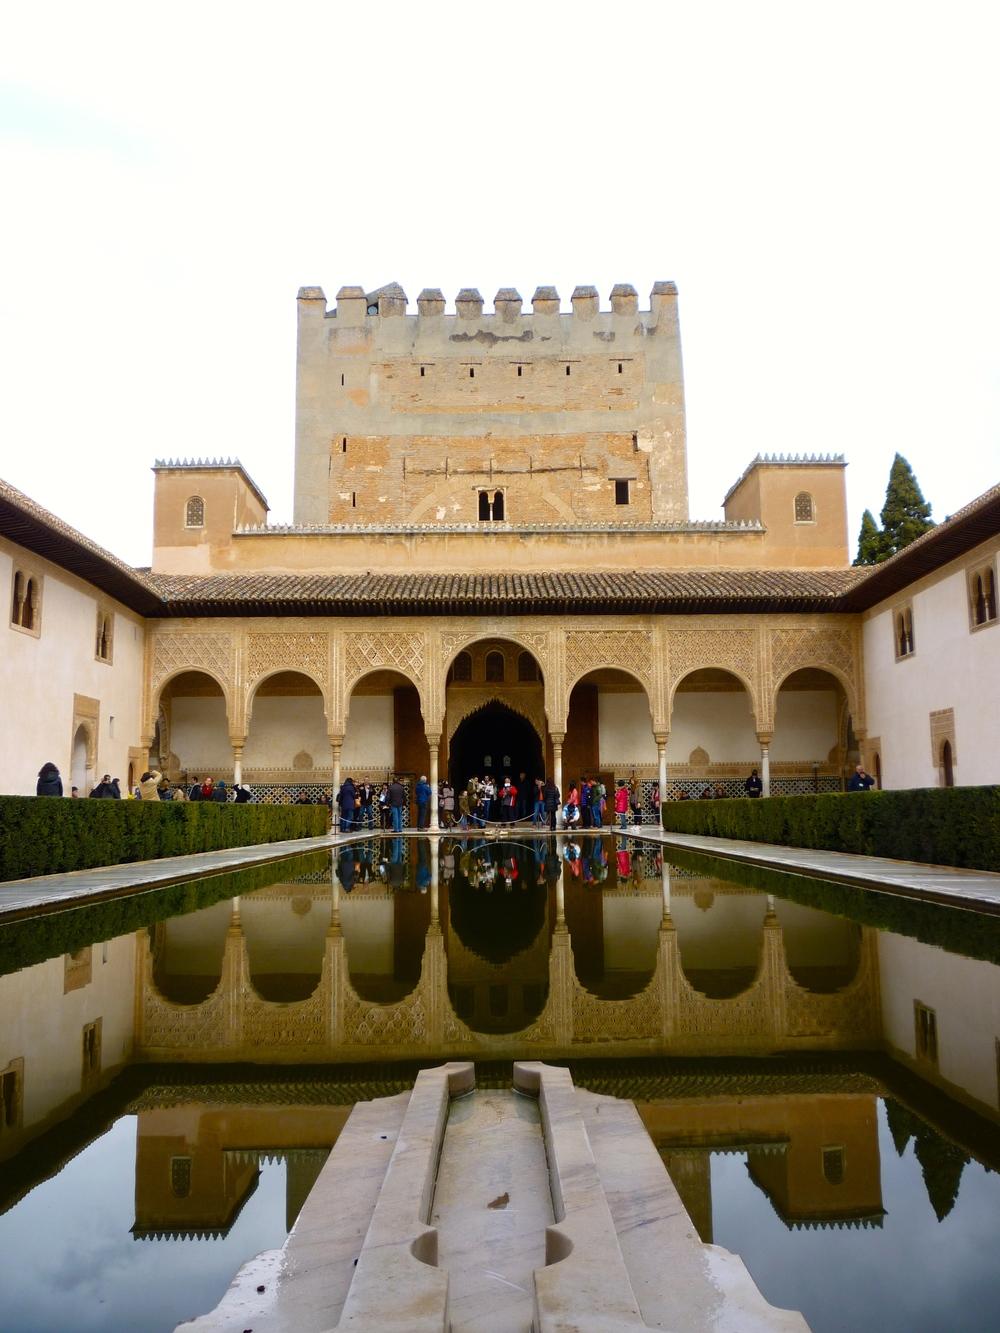 Inside the Moorish palace